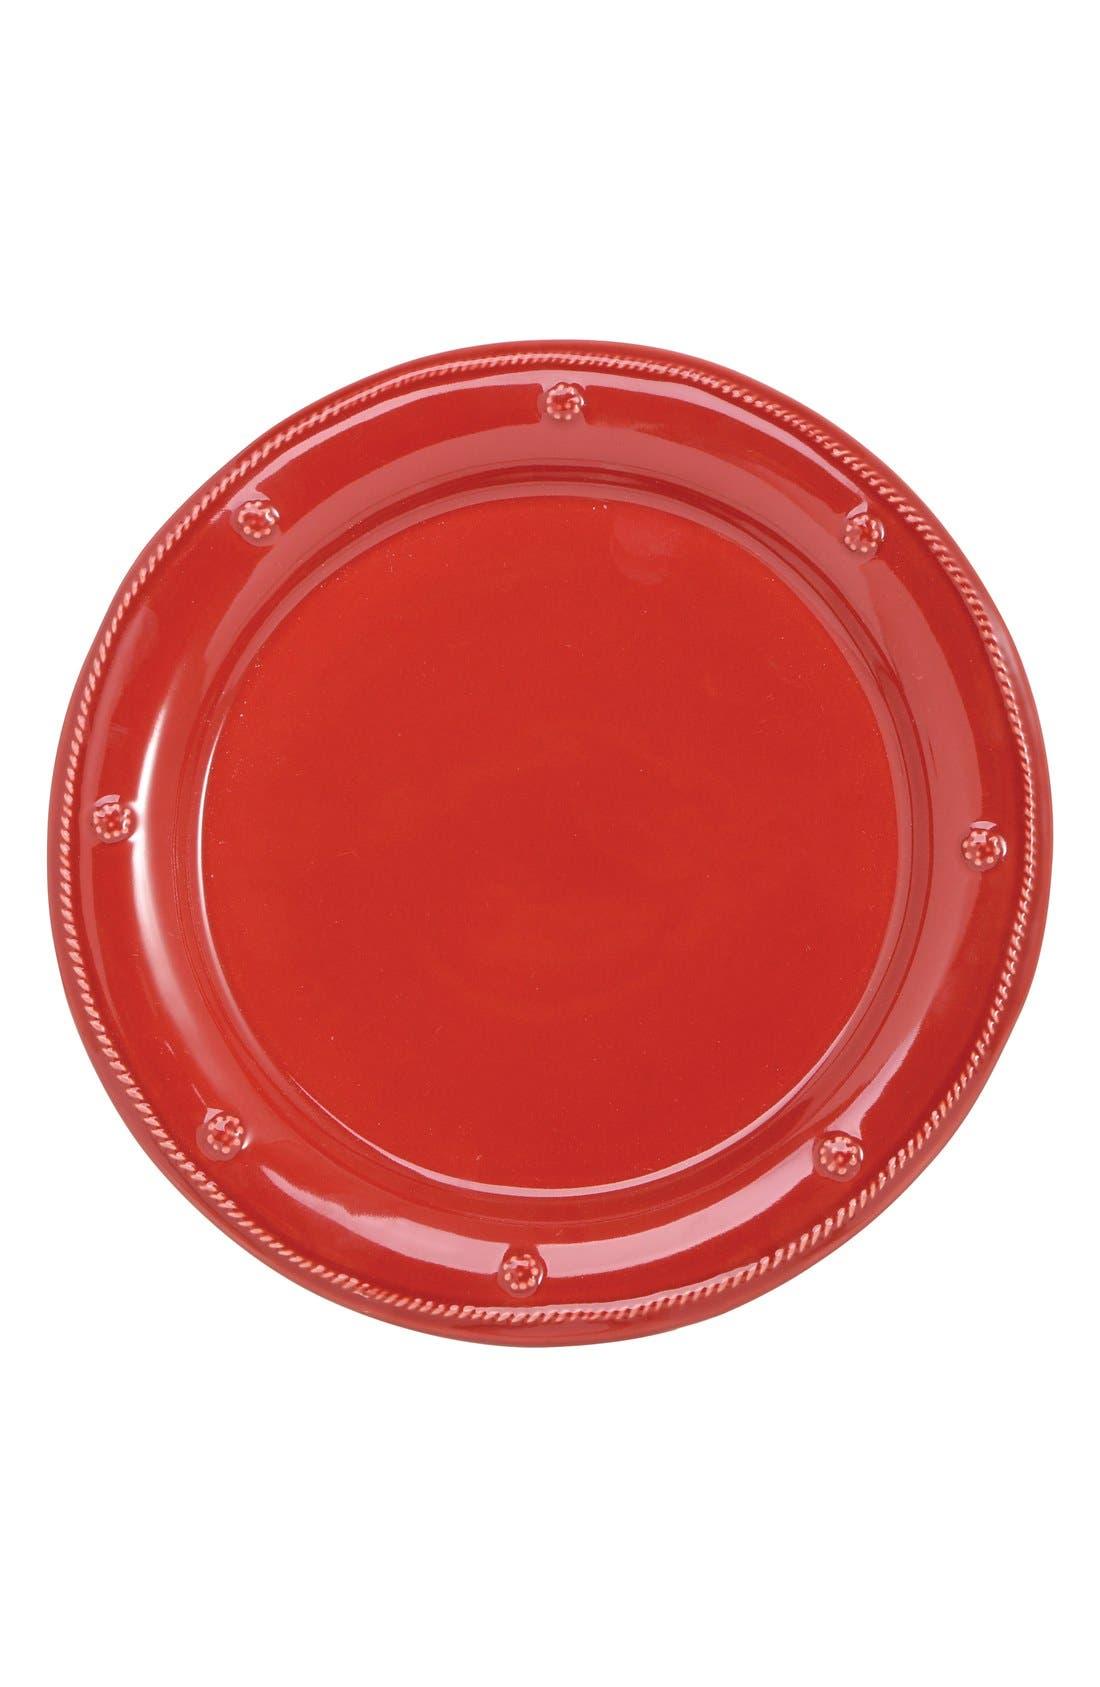 Main Image - Juliska'Berry and Thread' Dinner Plate